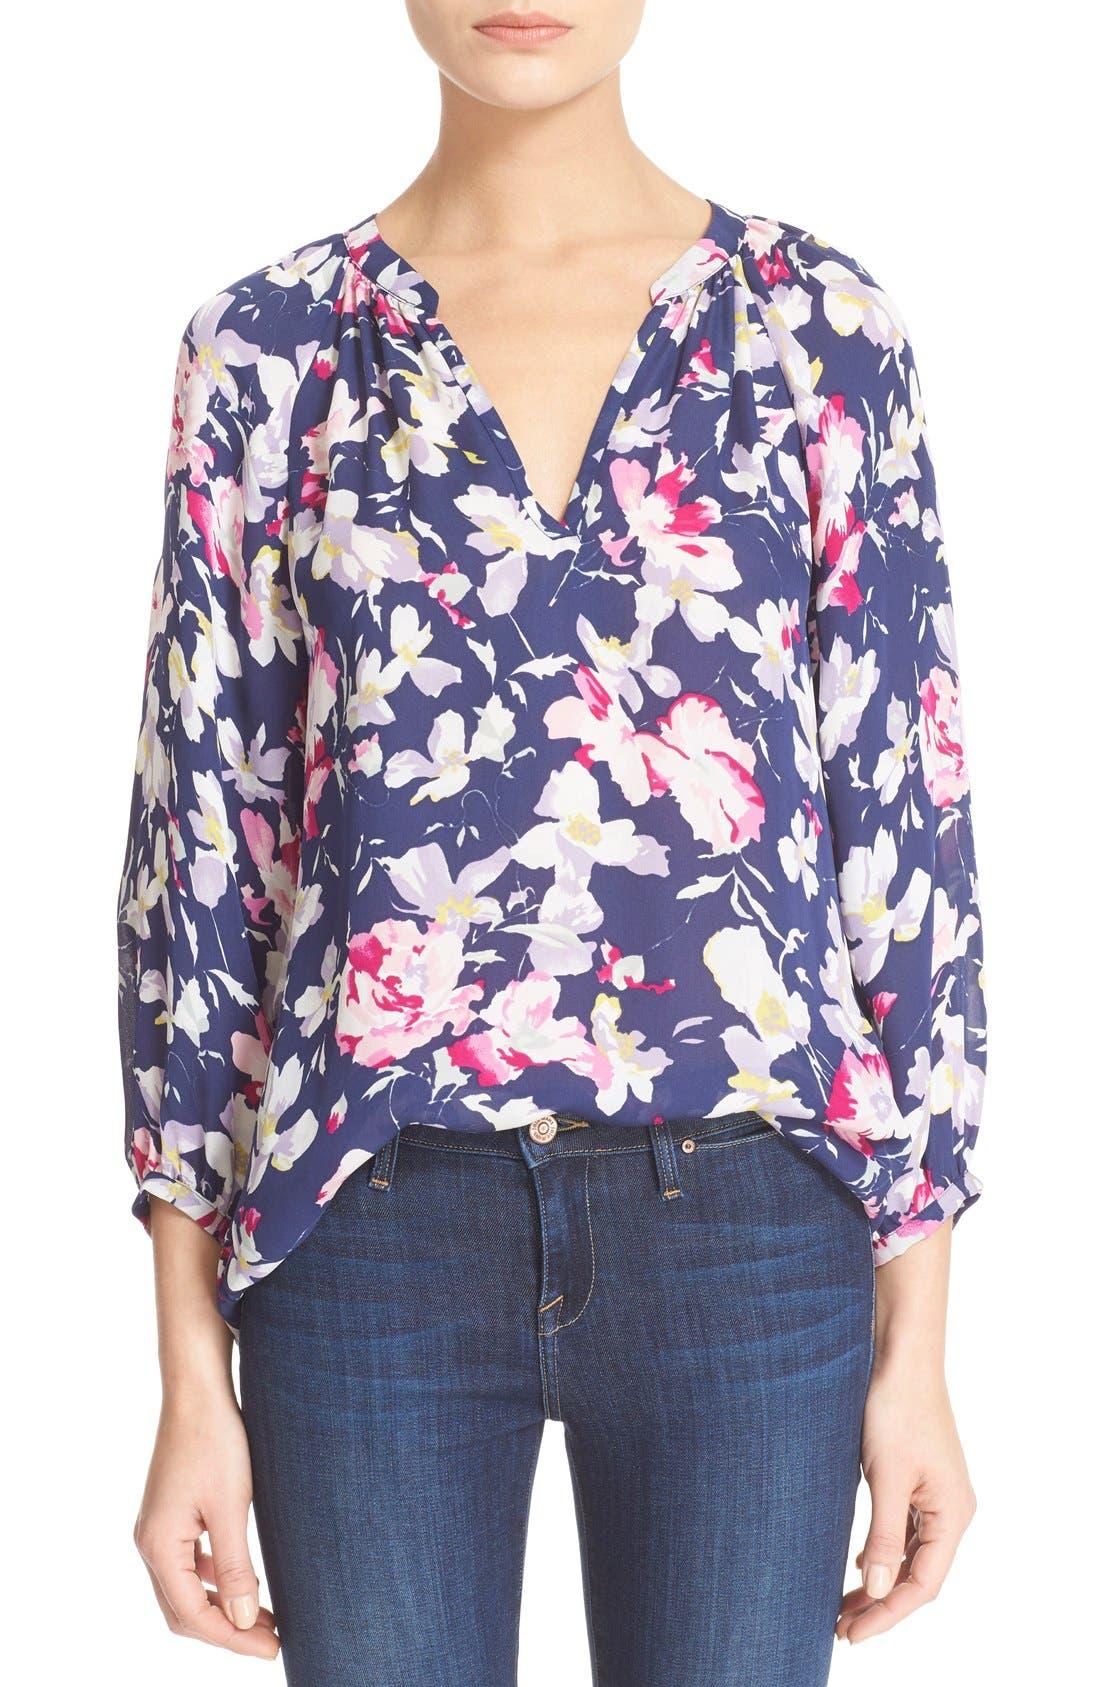 Alternate Image 1 Selected - Joie 'McKenna' Floral Print Silk Blouse